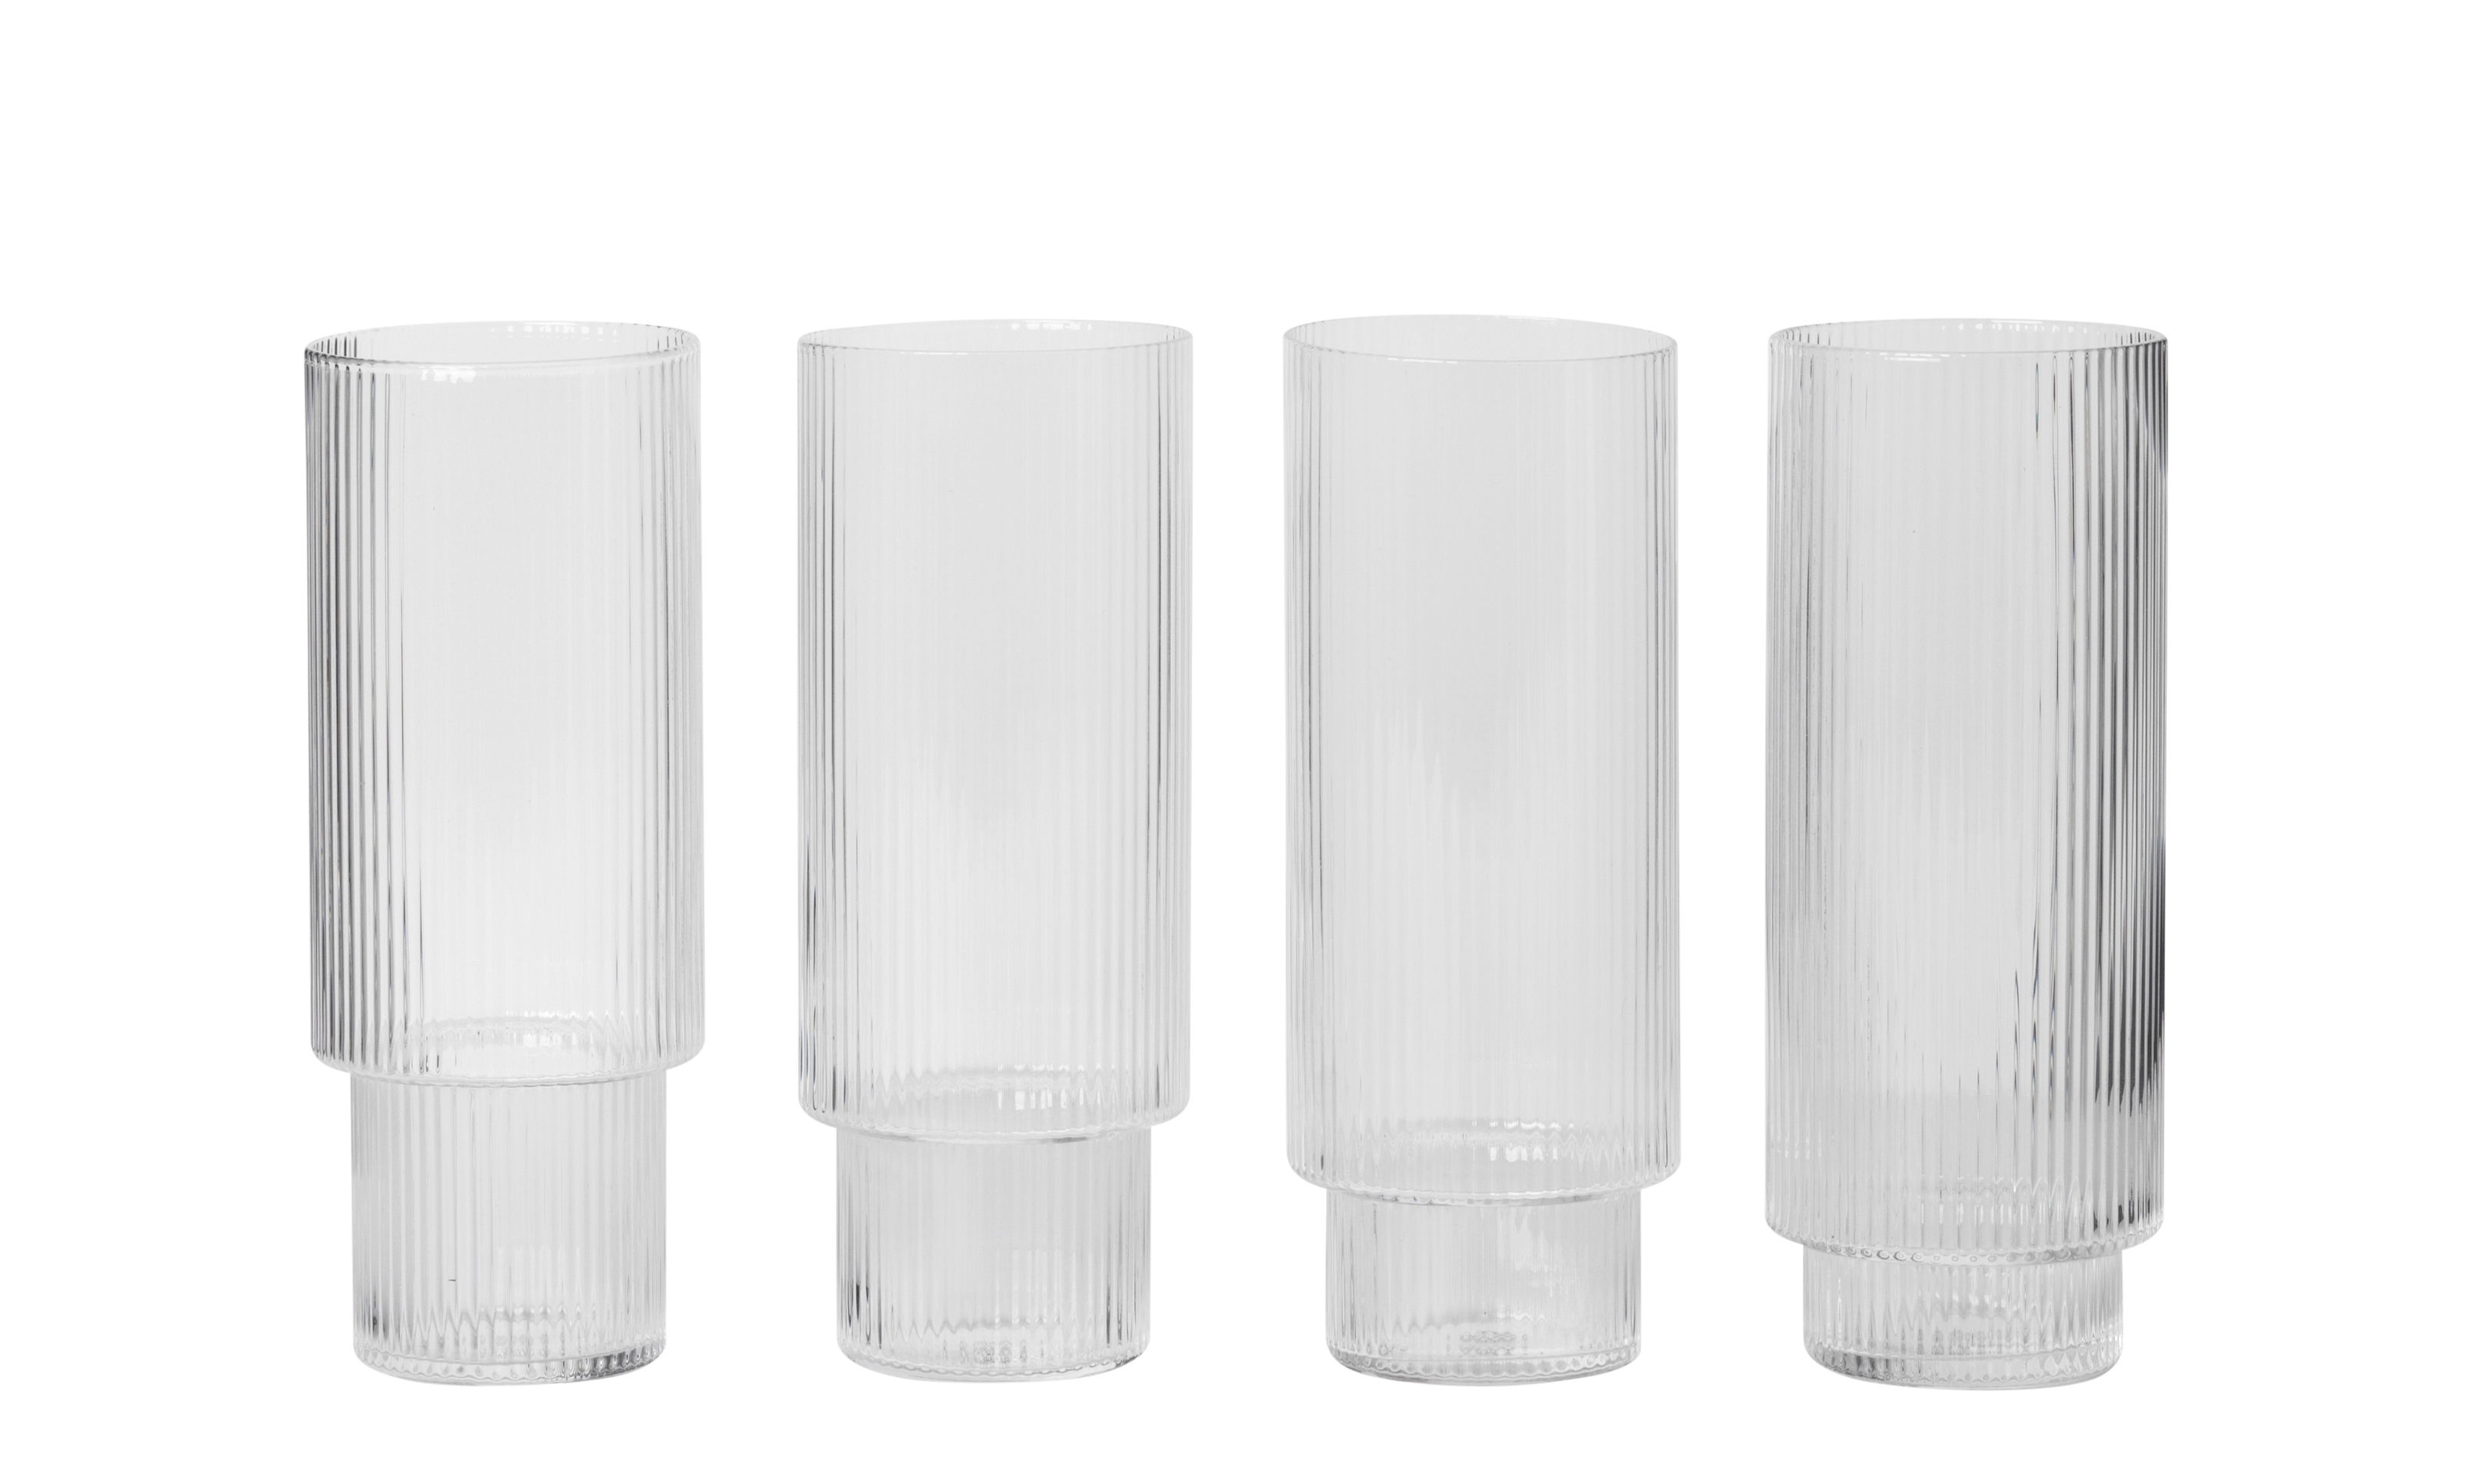 Tavola - Bicchieri  - Bicchiere da long drink Ripple - / Set da 4 - Vetro soffiato a bocca di Ferm Living - Trasparente / Strisce - Vetro soffiato a bocca